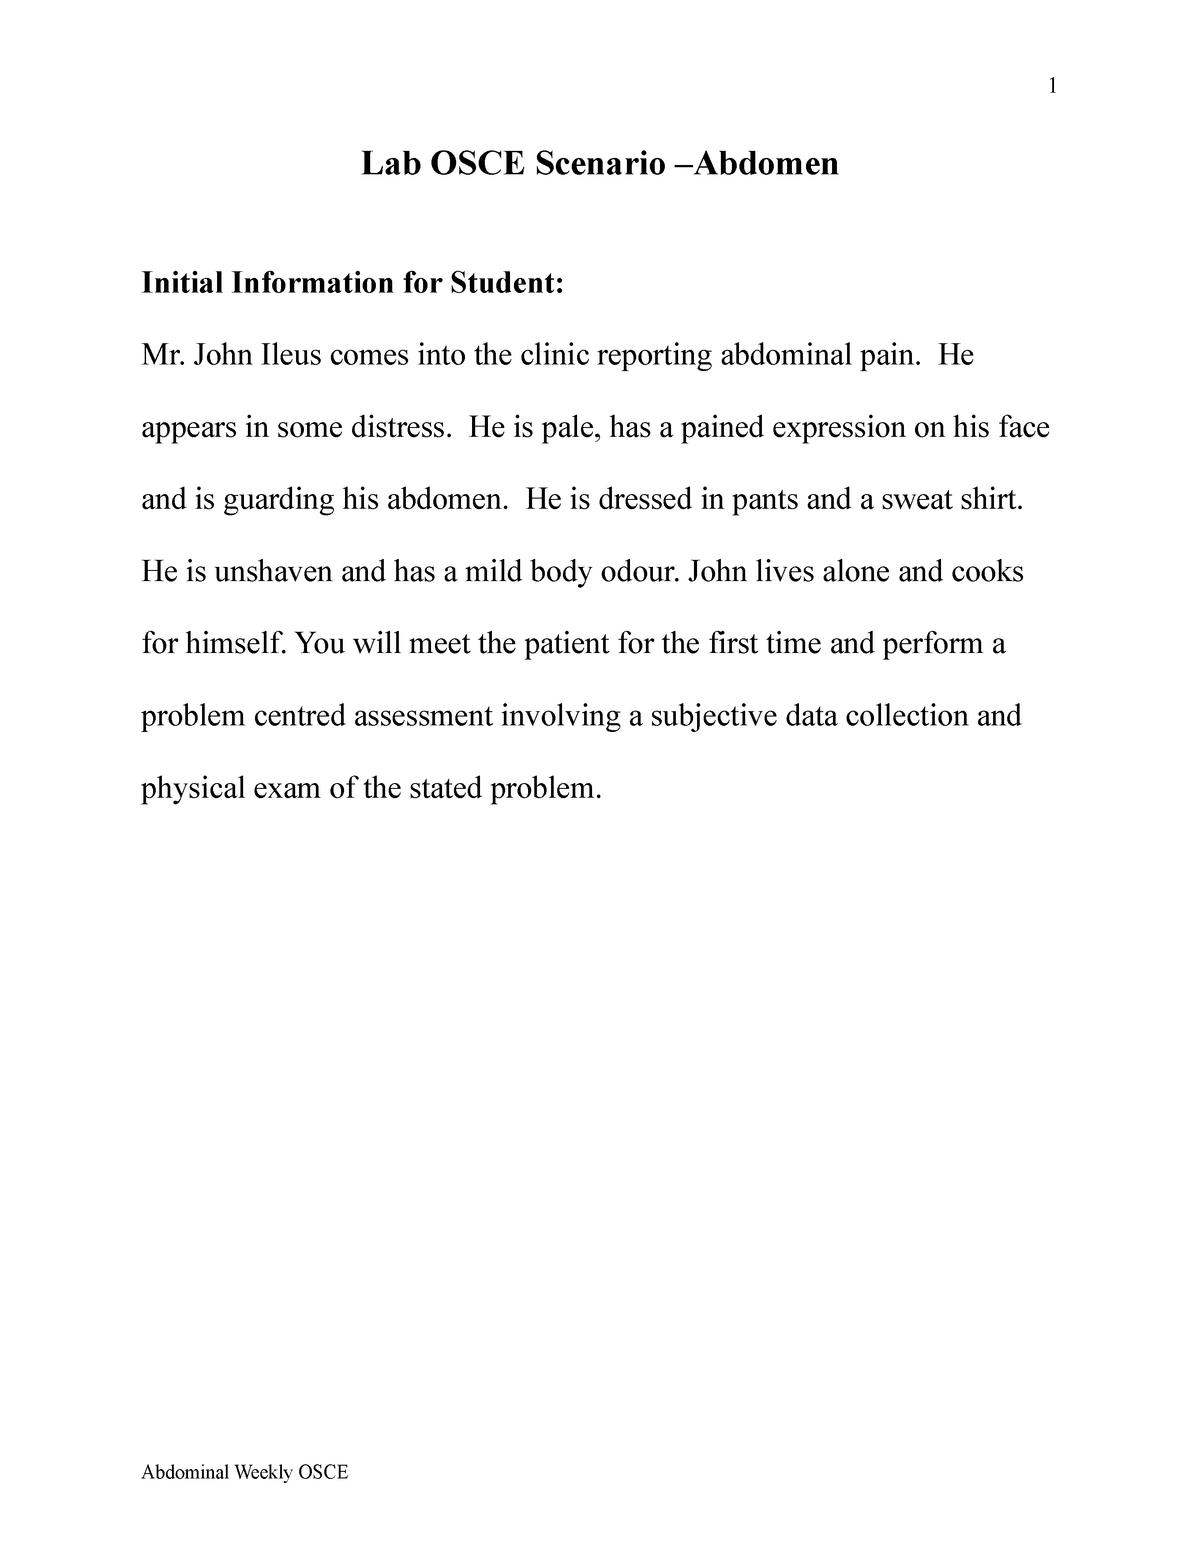 Practical - Prof  Bornais, Lab Osce Scenario –Abdomen - StuDocu